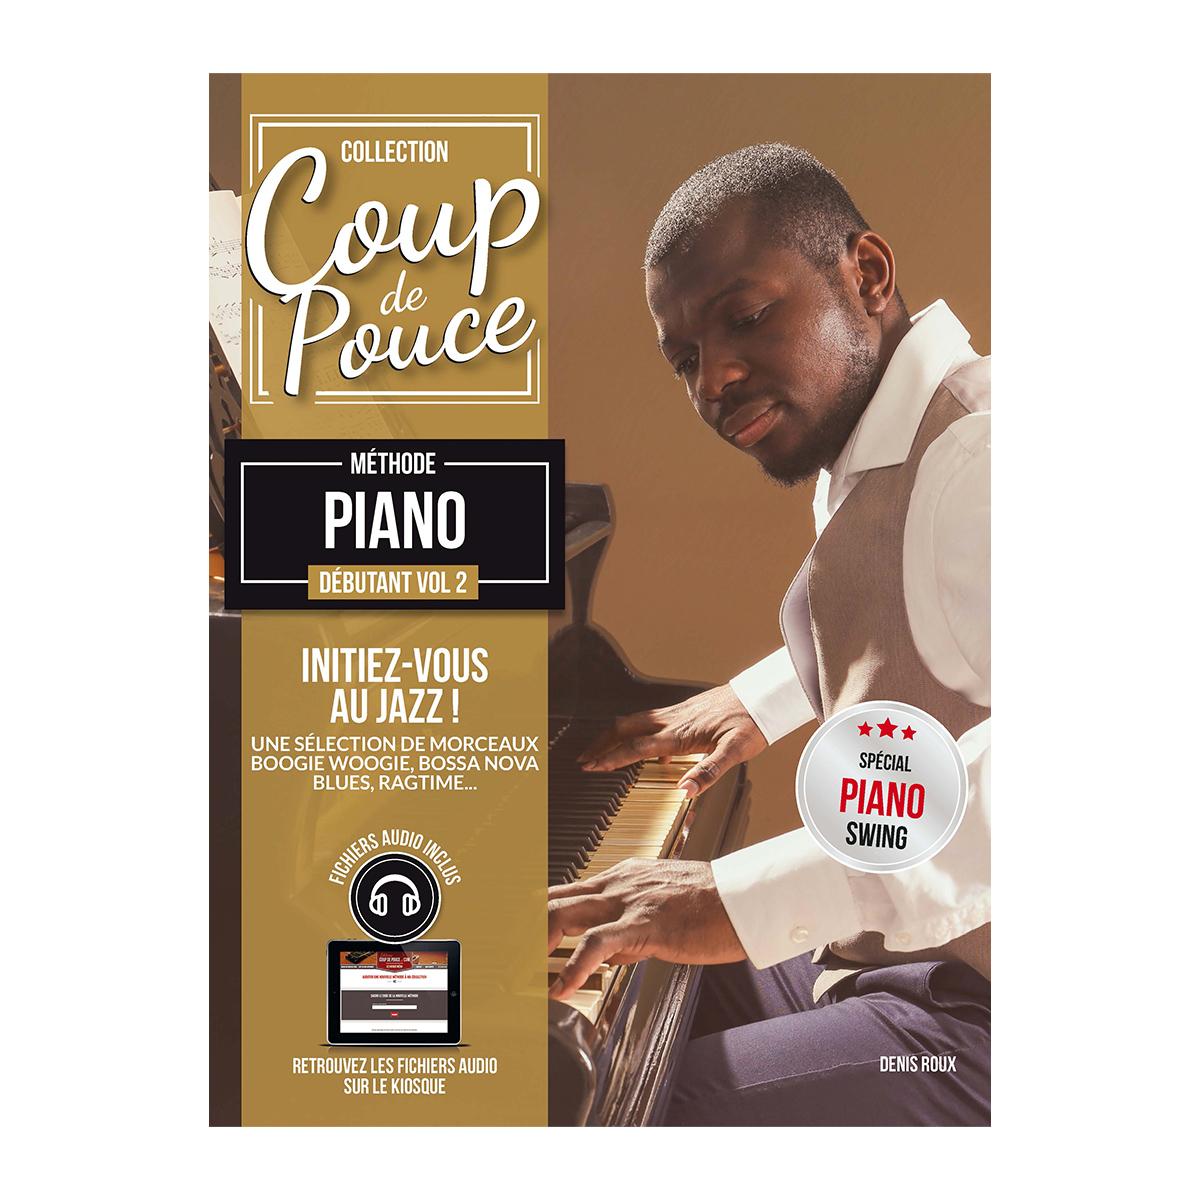 Débutant - Claviers Jazz. Sheet Music Downloads for Keyboard